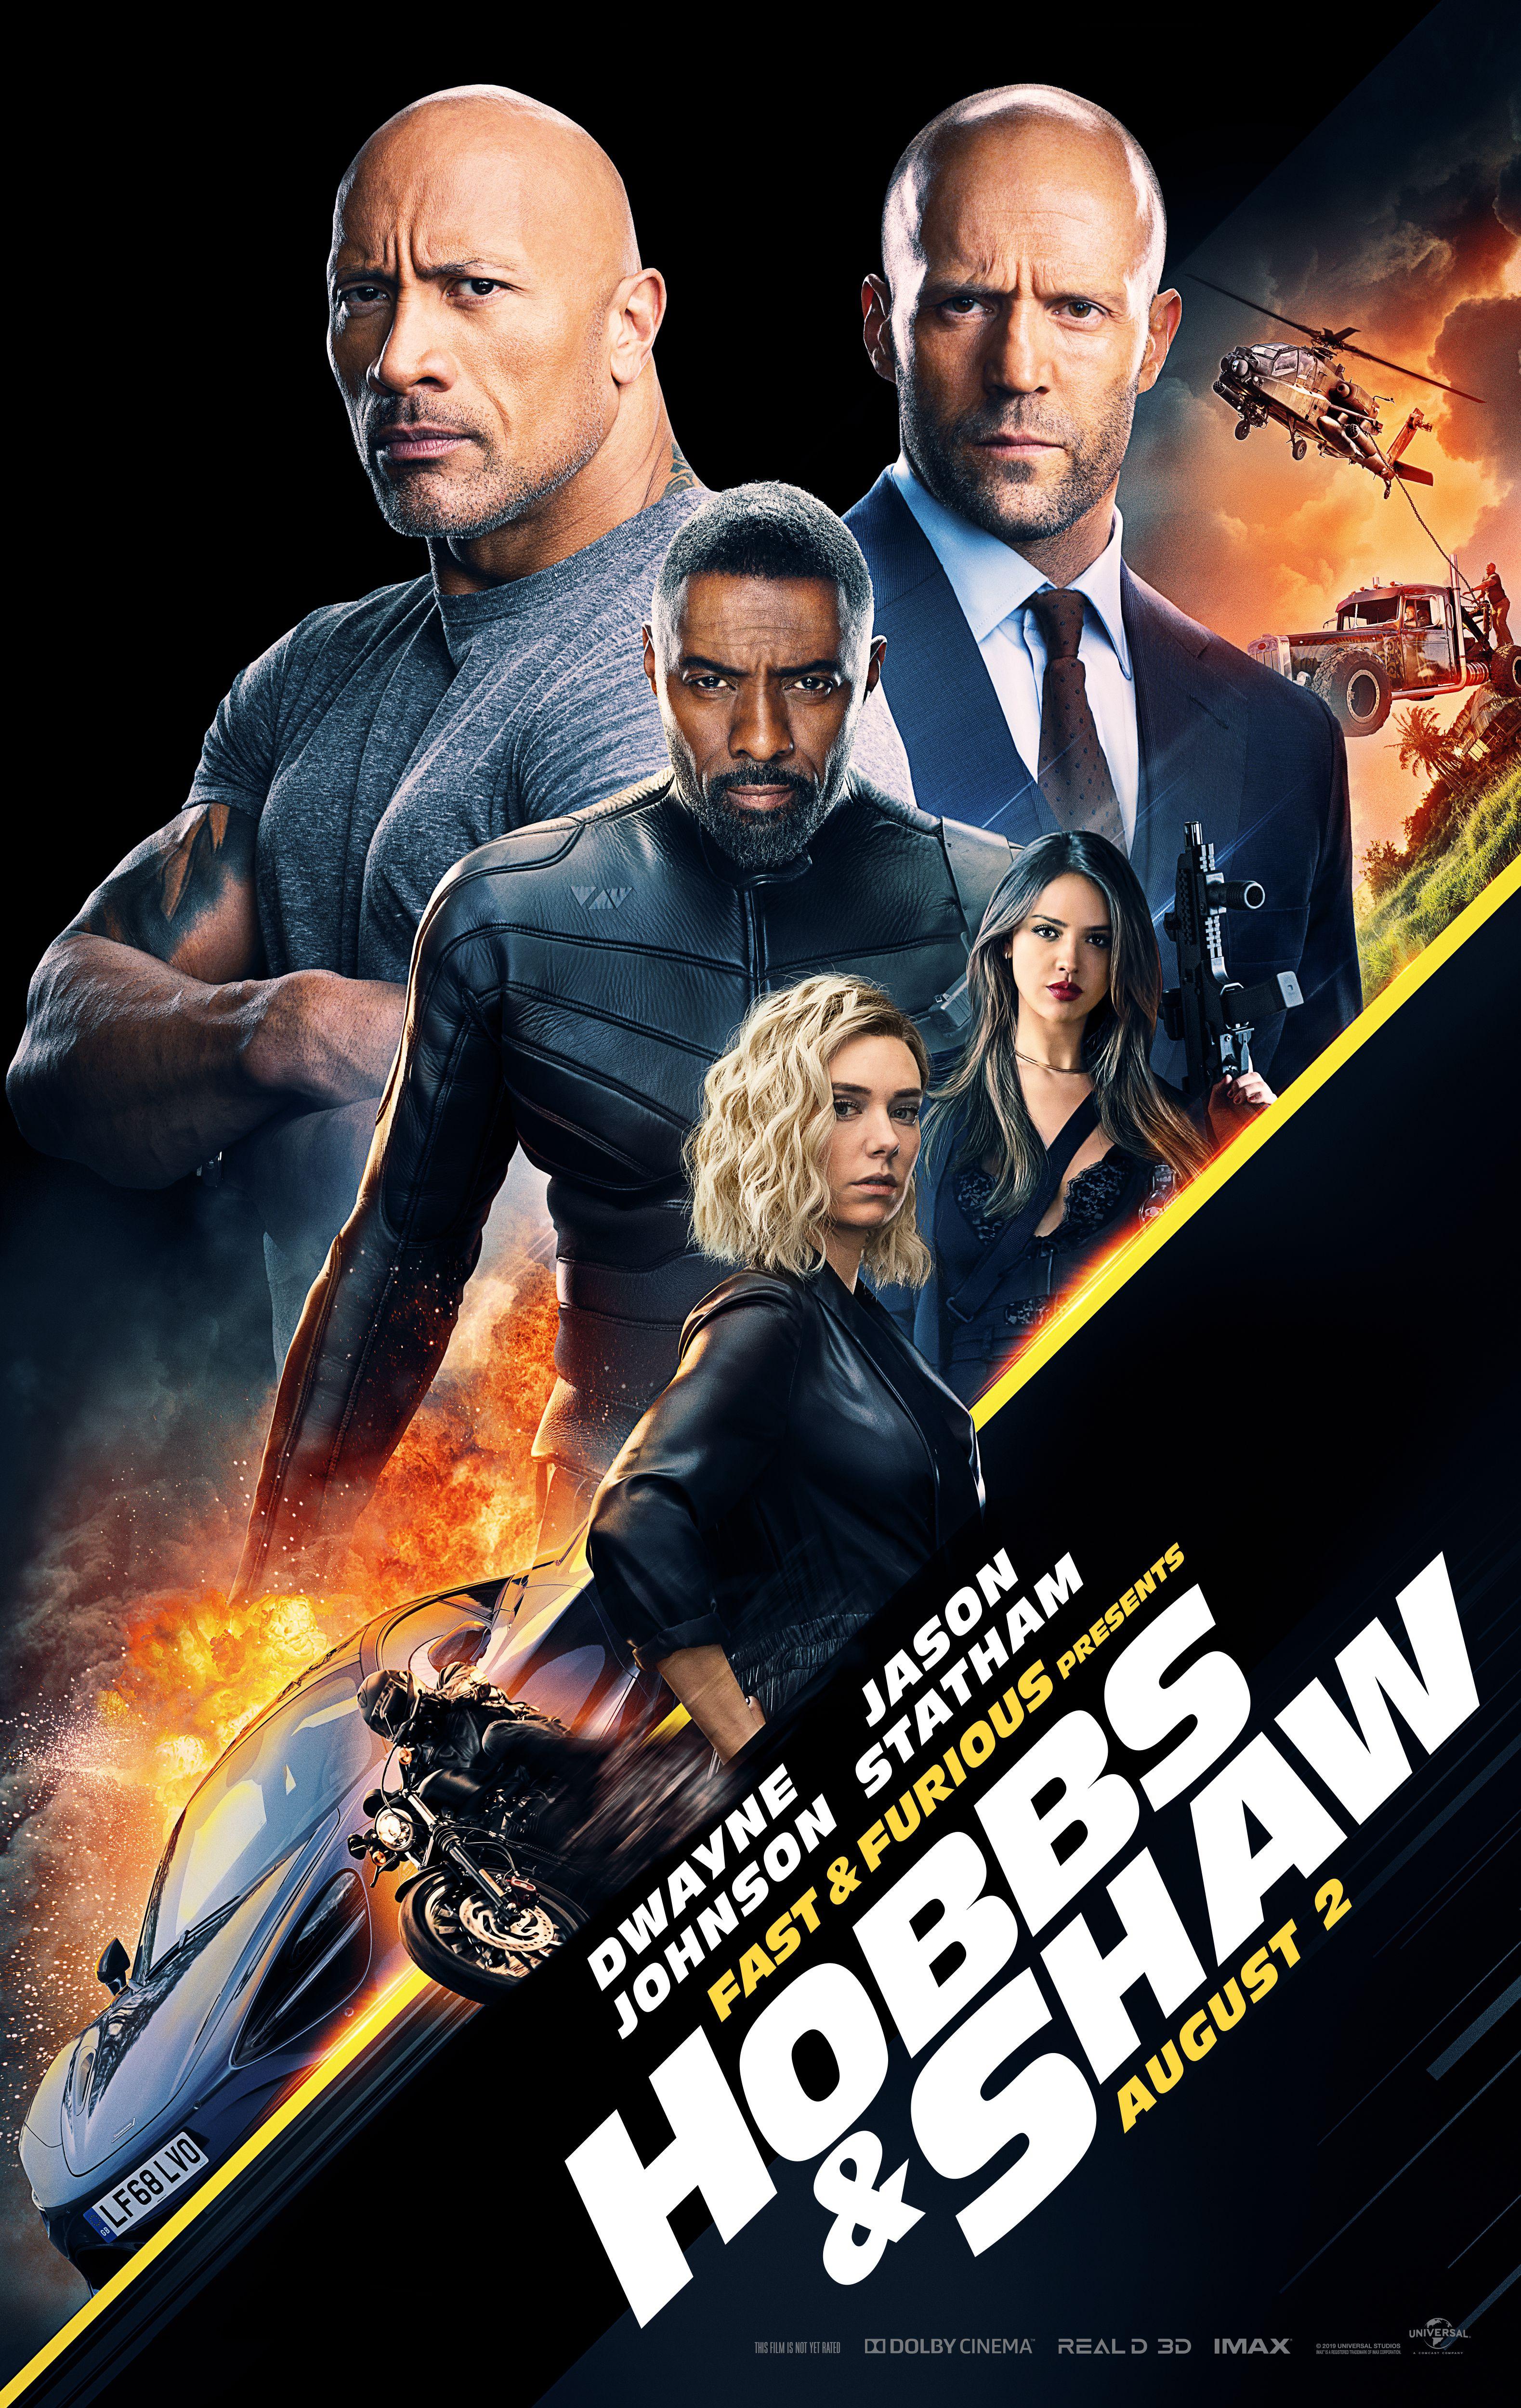 Hobbs & Shaw poster Dwayne Johnson, Idris Elba, Jason Statham, Vanessa Kirby, Eiza Gonzalez